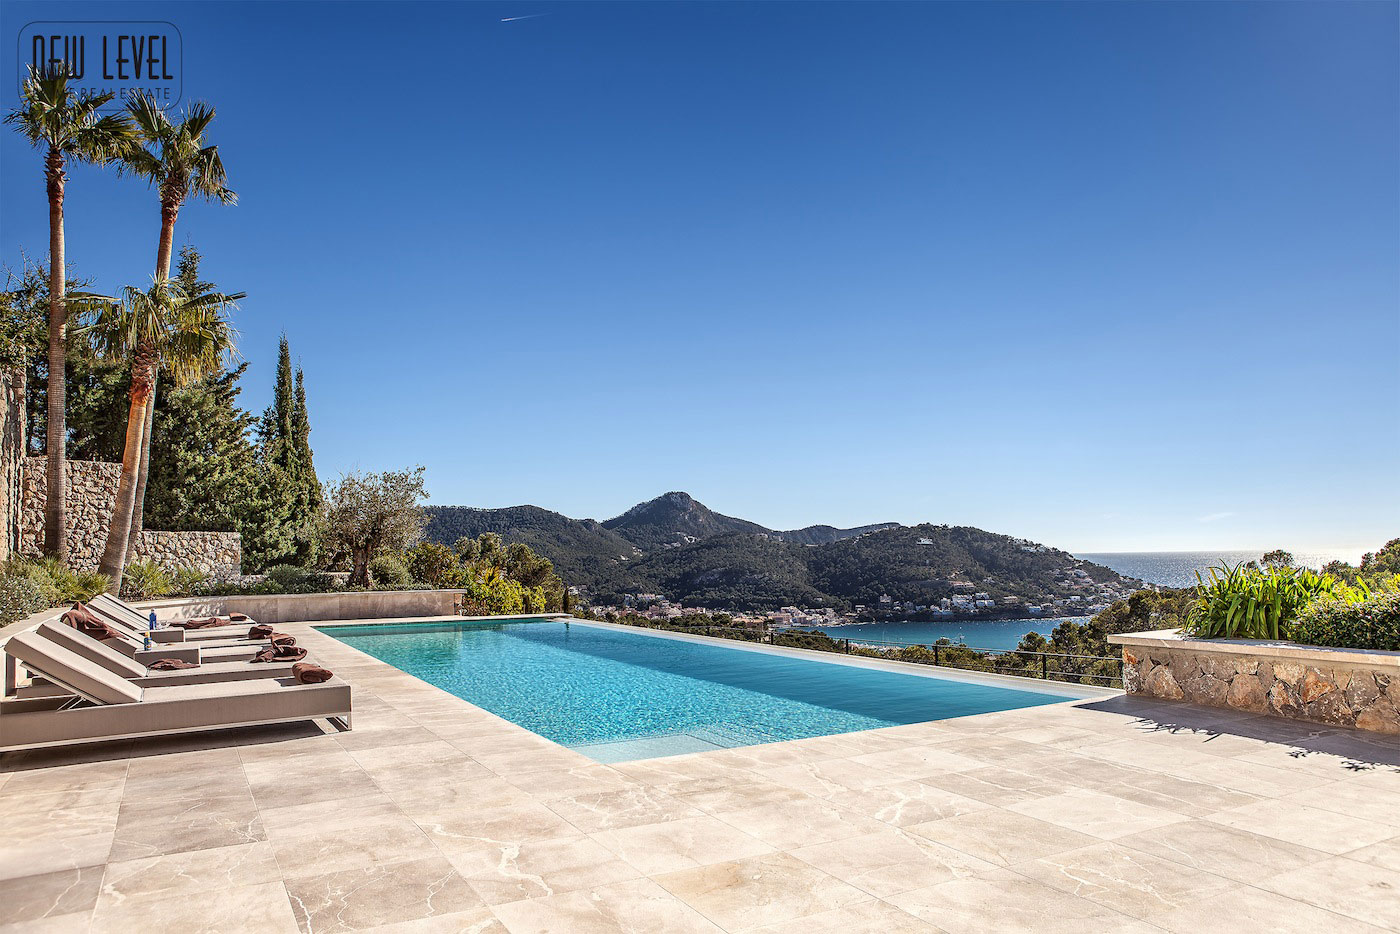 Infinity Pool, Amazing Views, Fabulous Villa in Puerto de Andratx, Mallorca